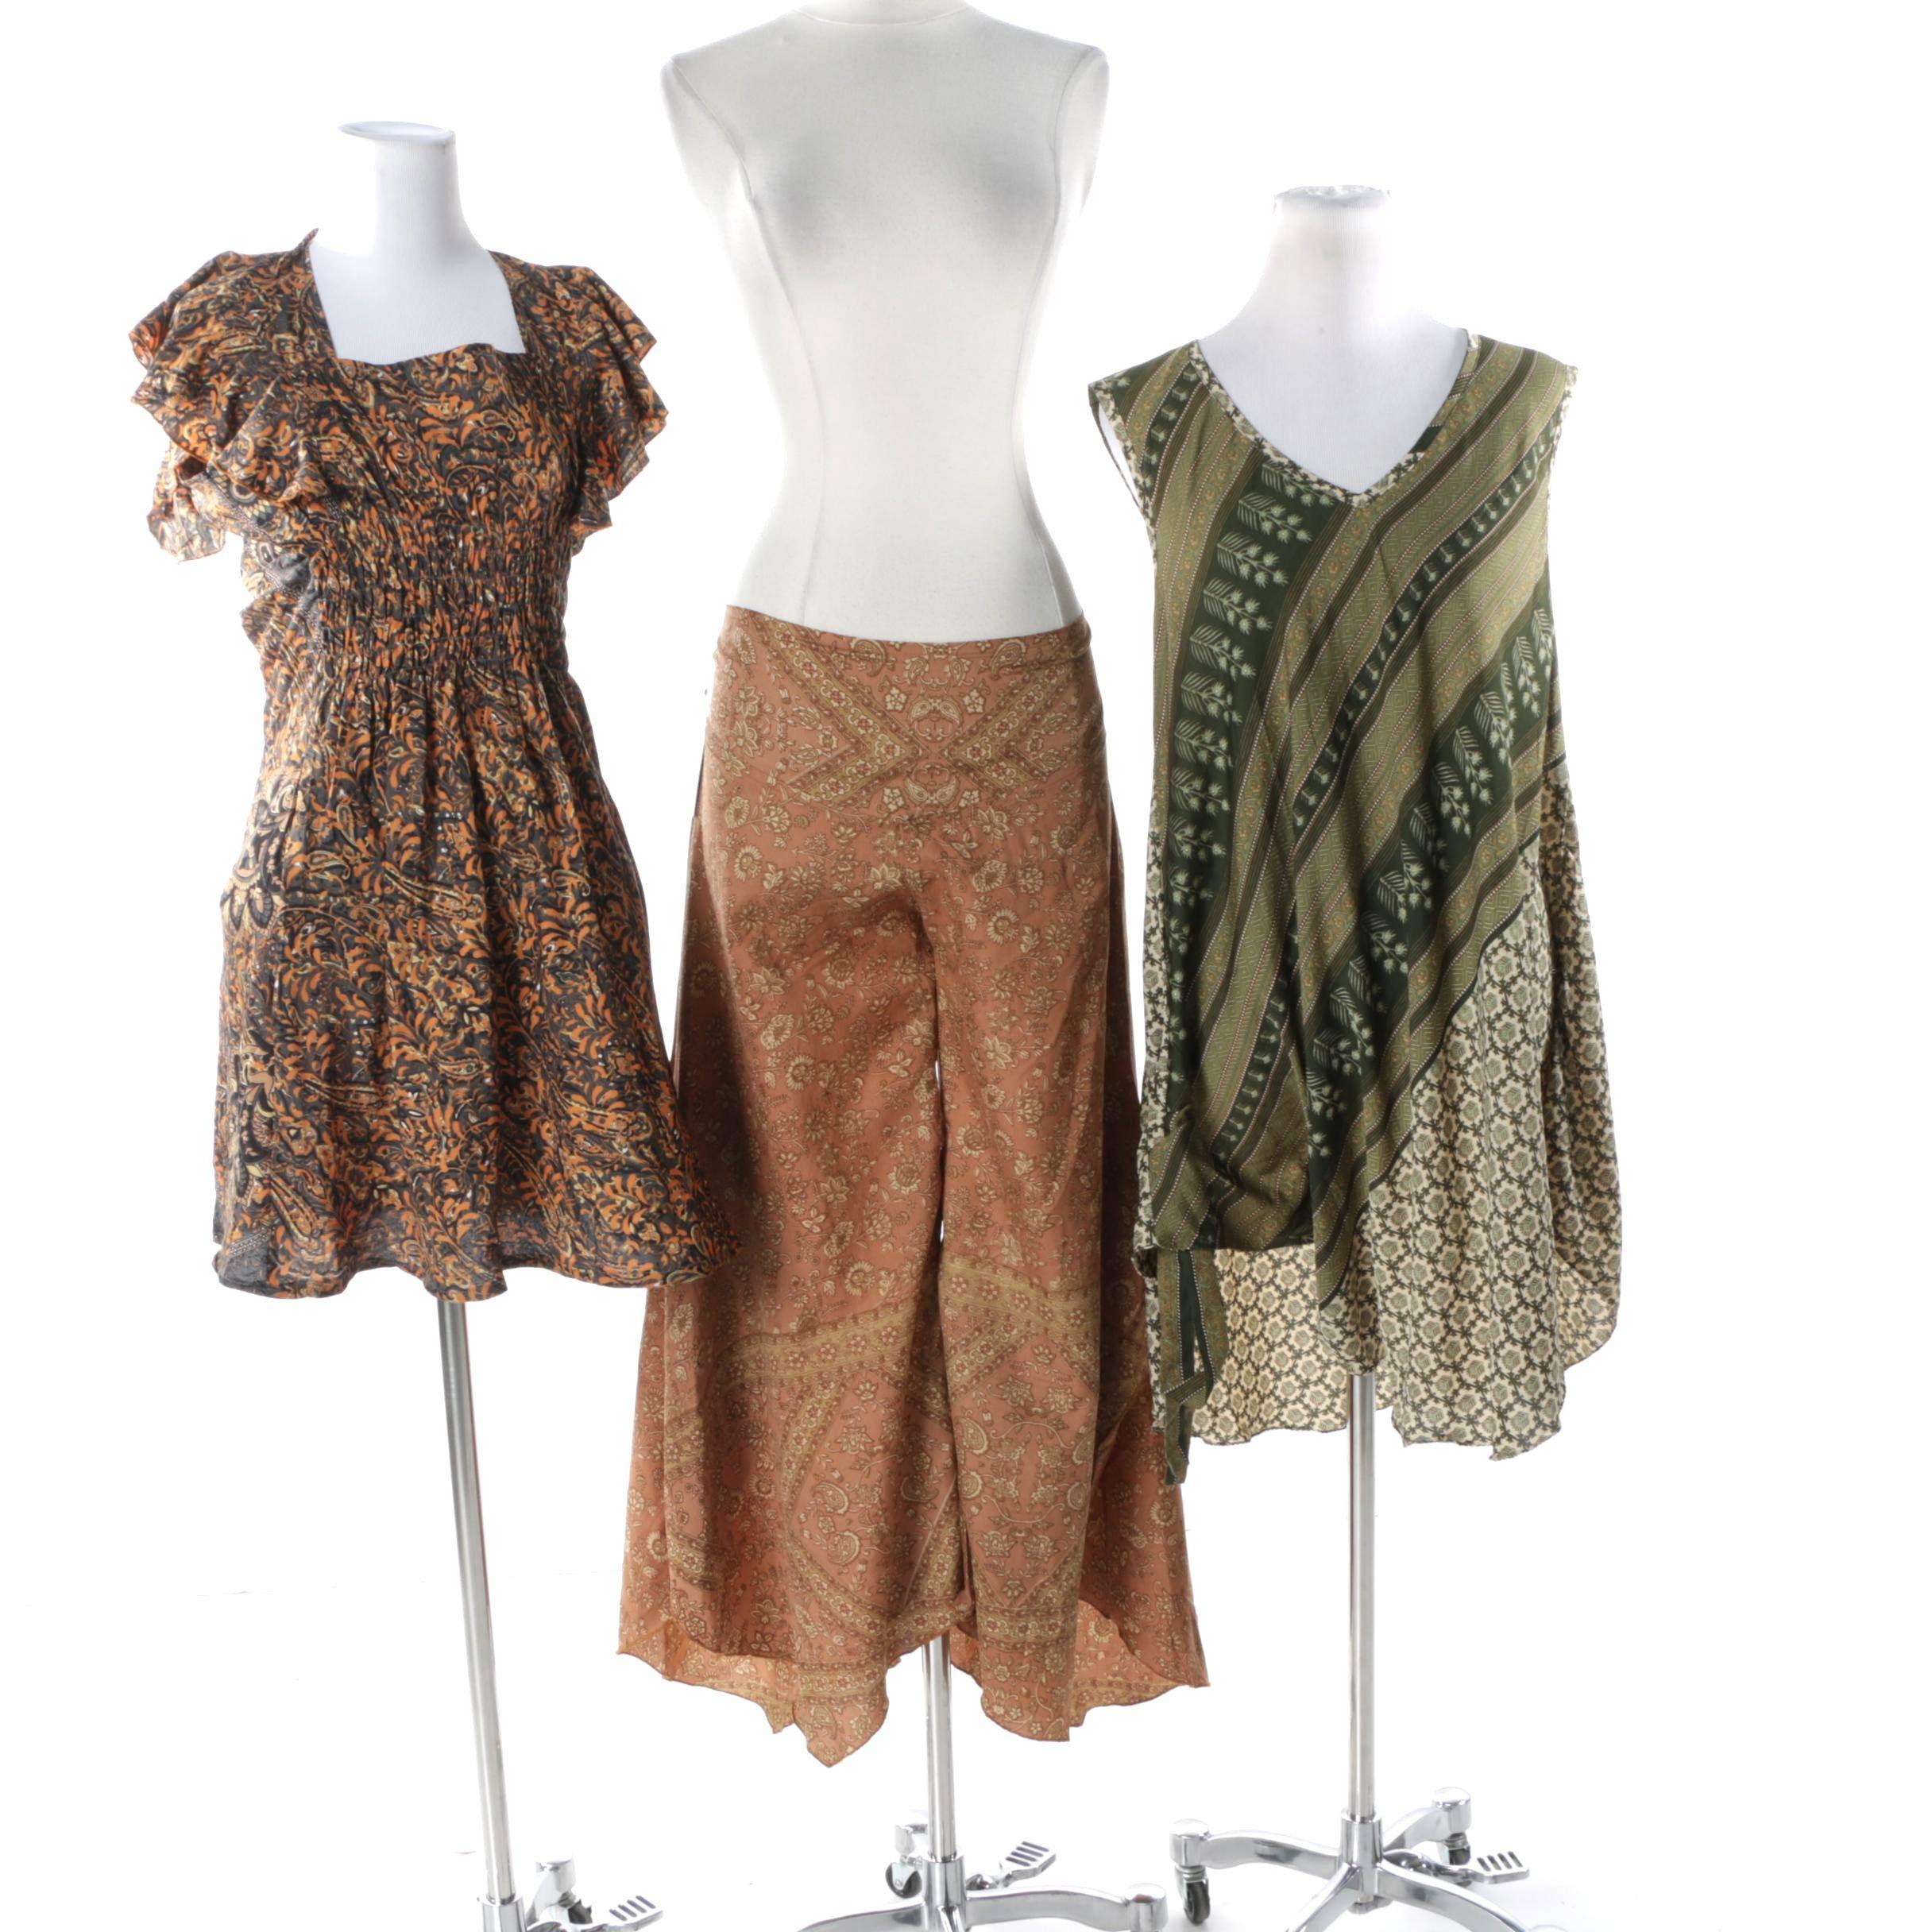 Women's Aller Simplement Size Medium Dress, Tunic and Pants